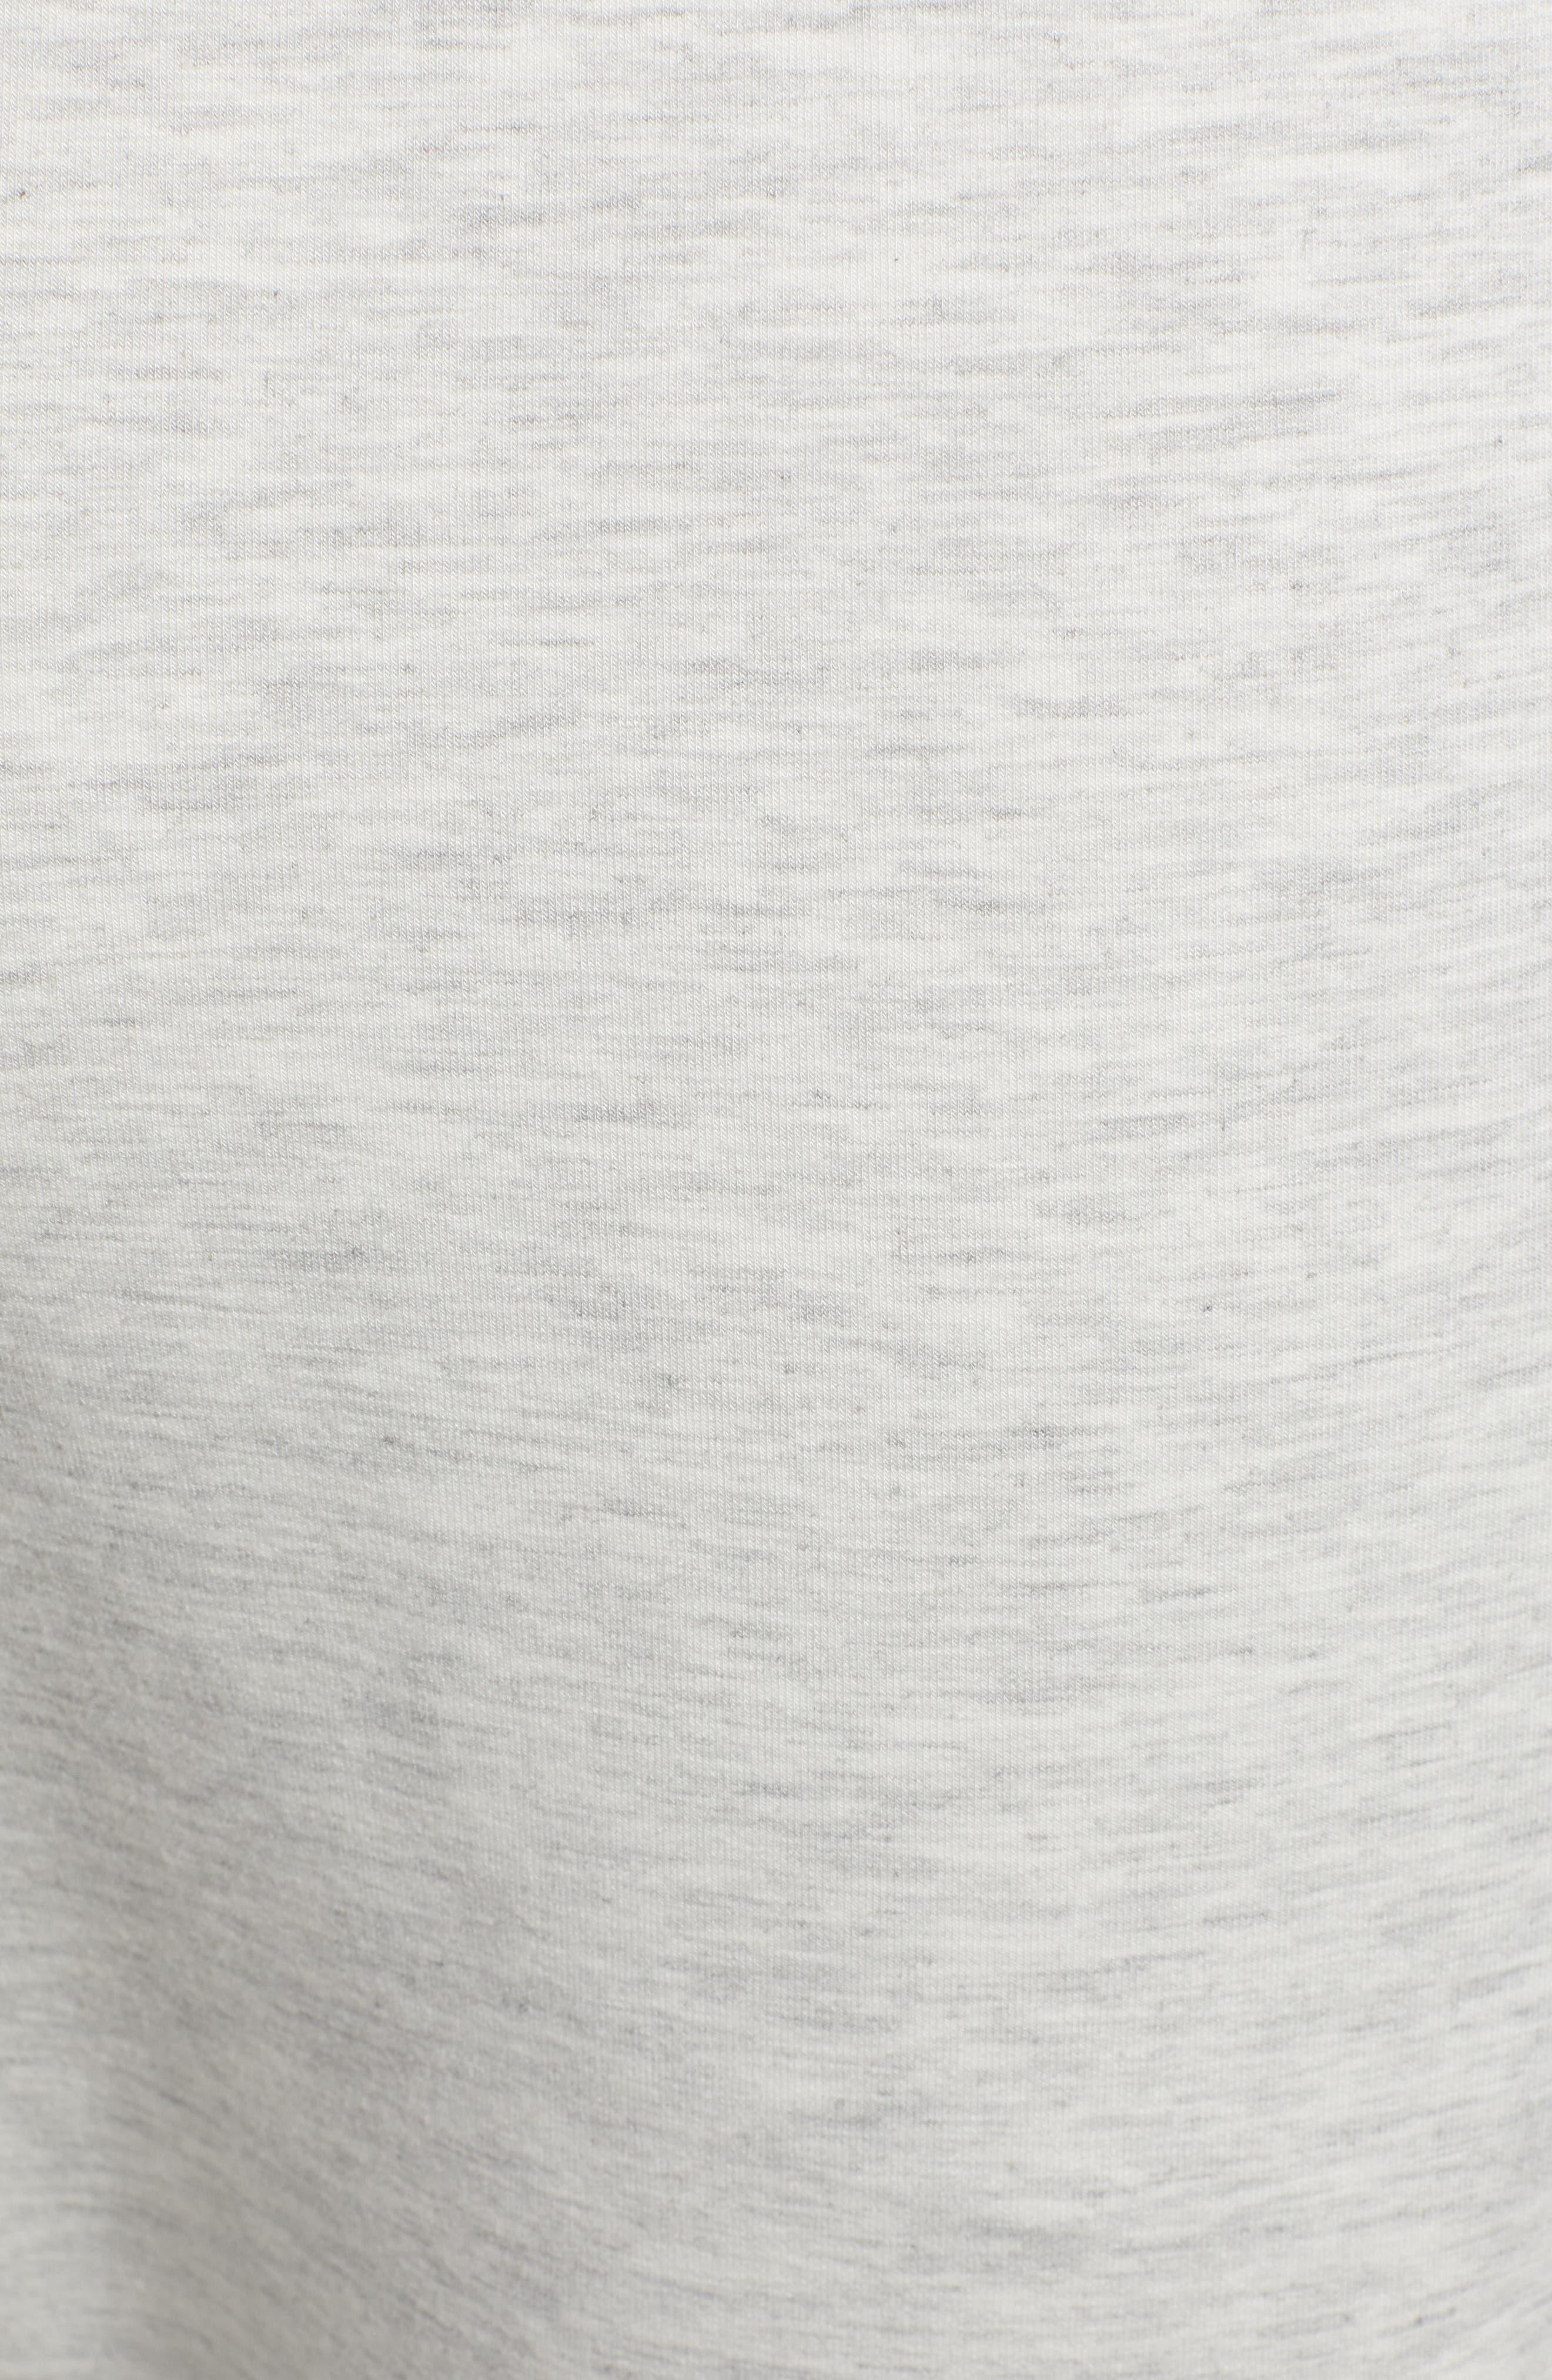 ZELLA, Zip Pocket Tech Jogger Pants, Alternate thumbnail 6, color, WHITE OXIDE MELANGE